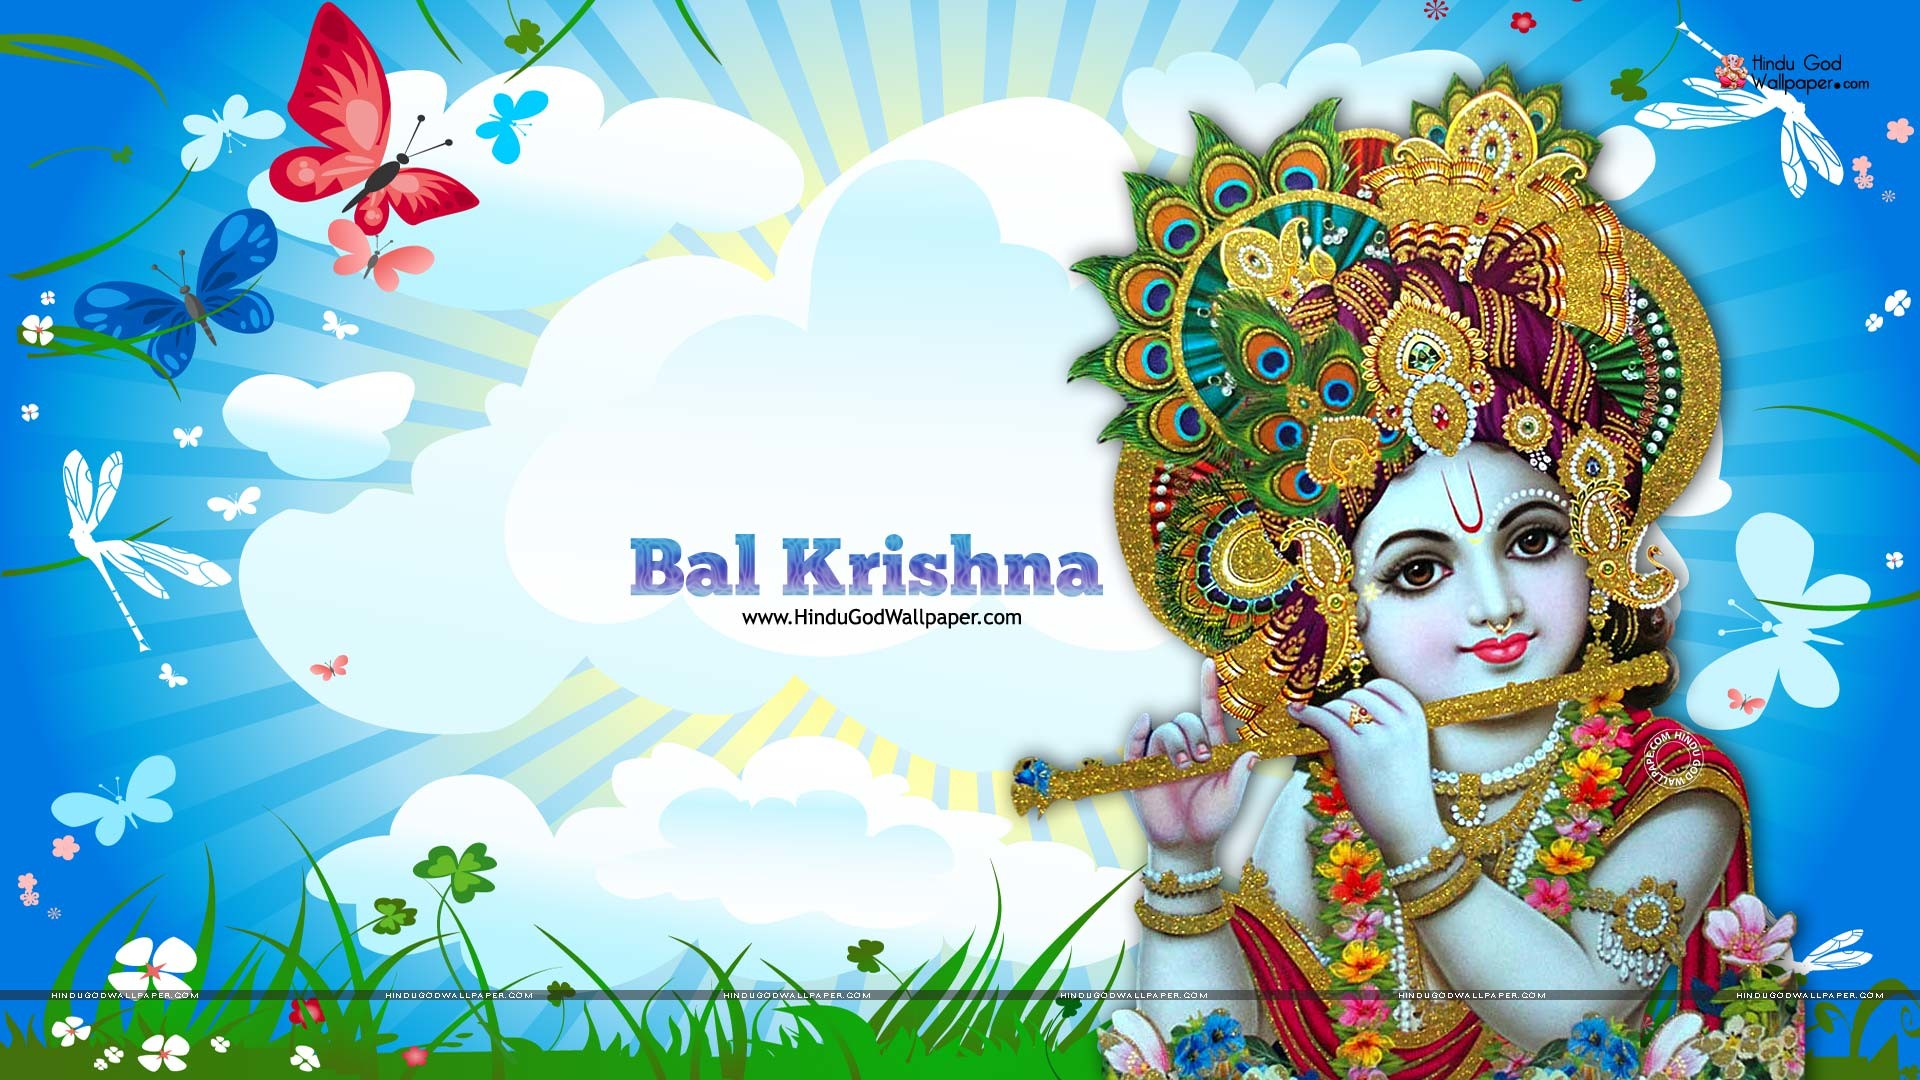 Shri Krishna Hd Photo 1920: Hindu God HD Wallpapers 1080p (68+ Images